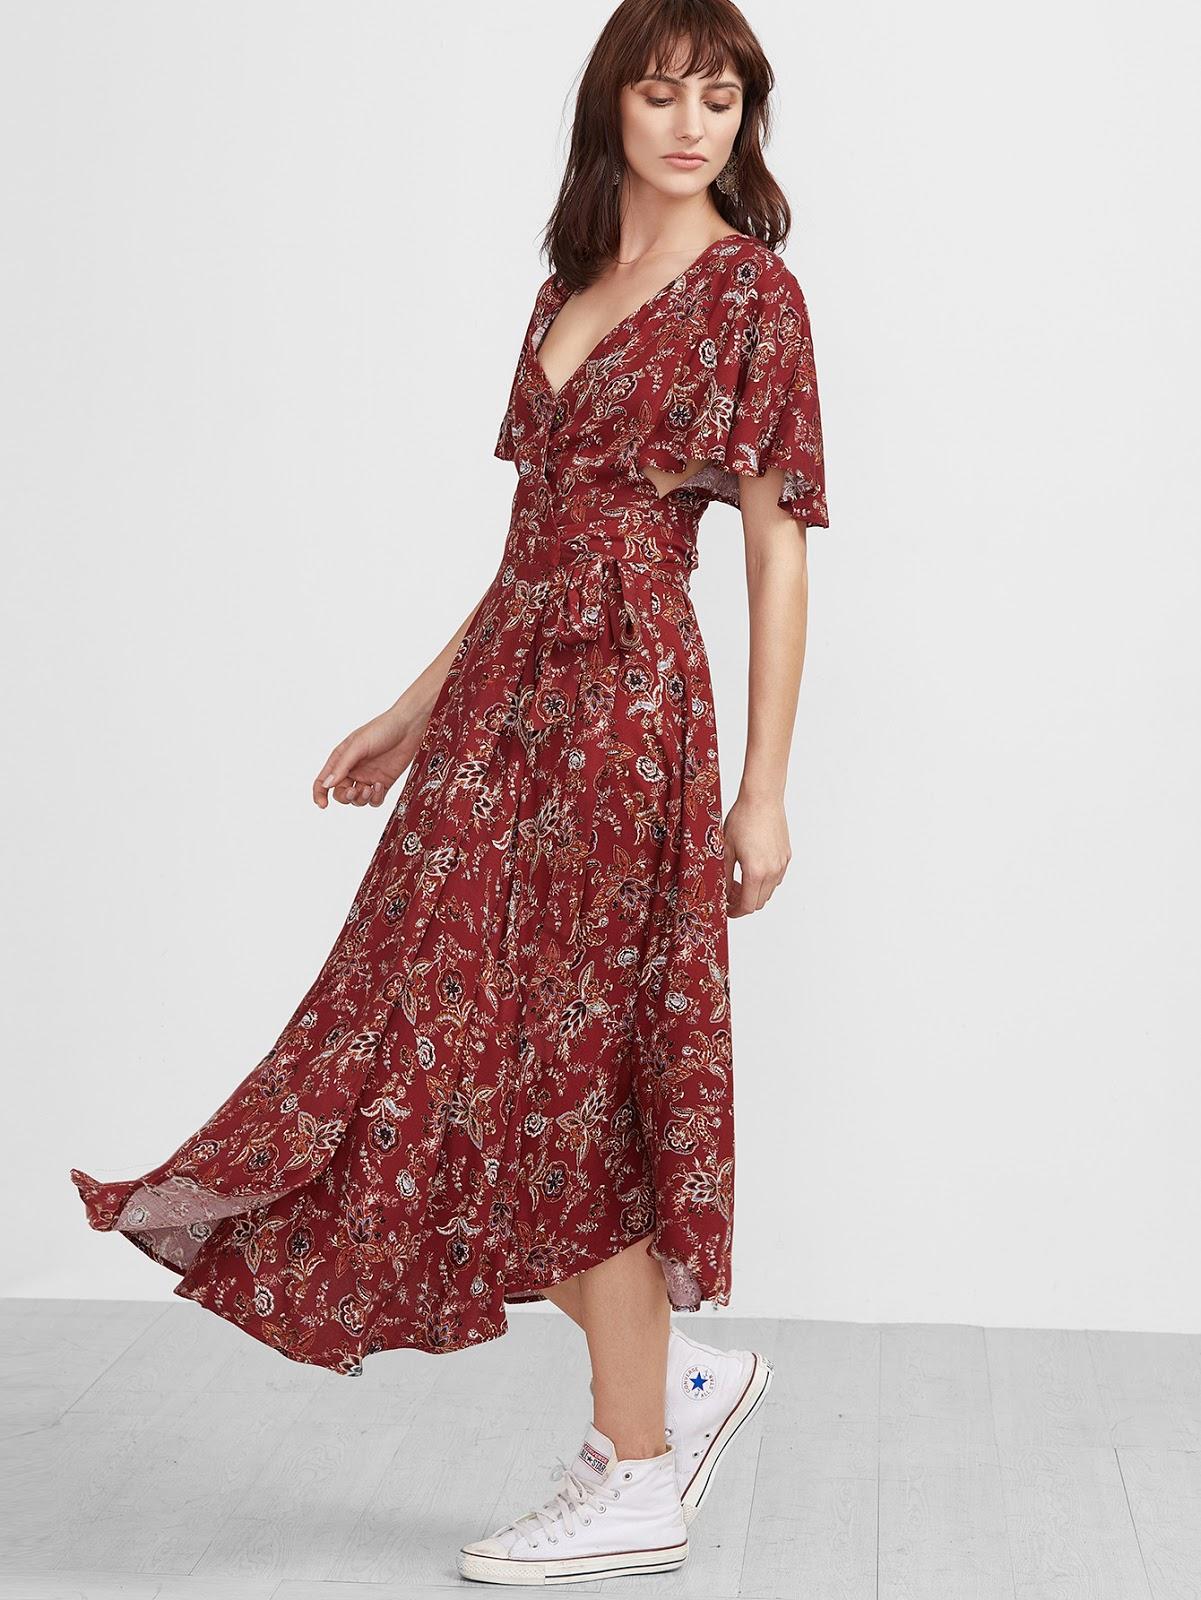 565d2f2c80 vestido rojo largo fiesta. vestidos rojos juveniles